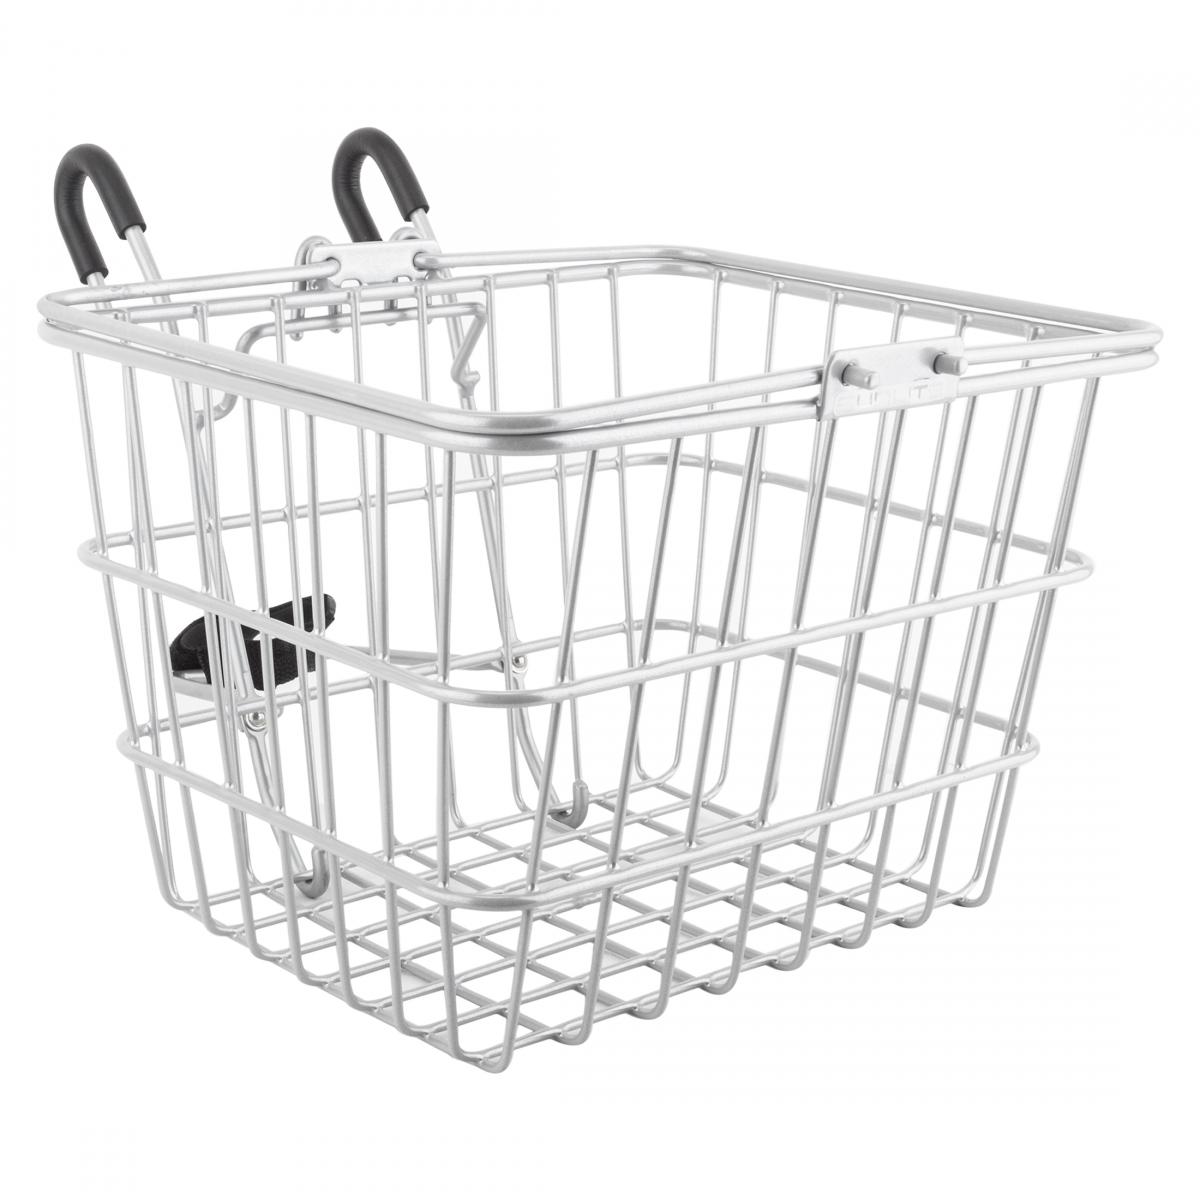 Sunlite Mini Lift-Off Basket Basket Sunlt Ft Wire L//o Sml Wh W//bracket